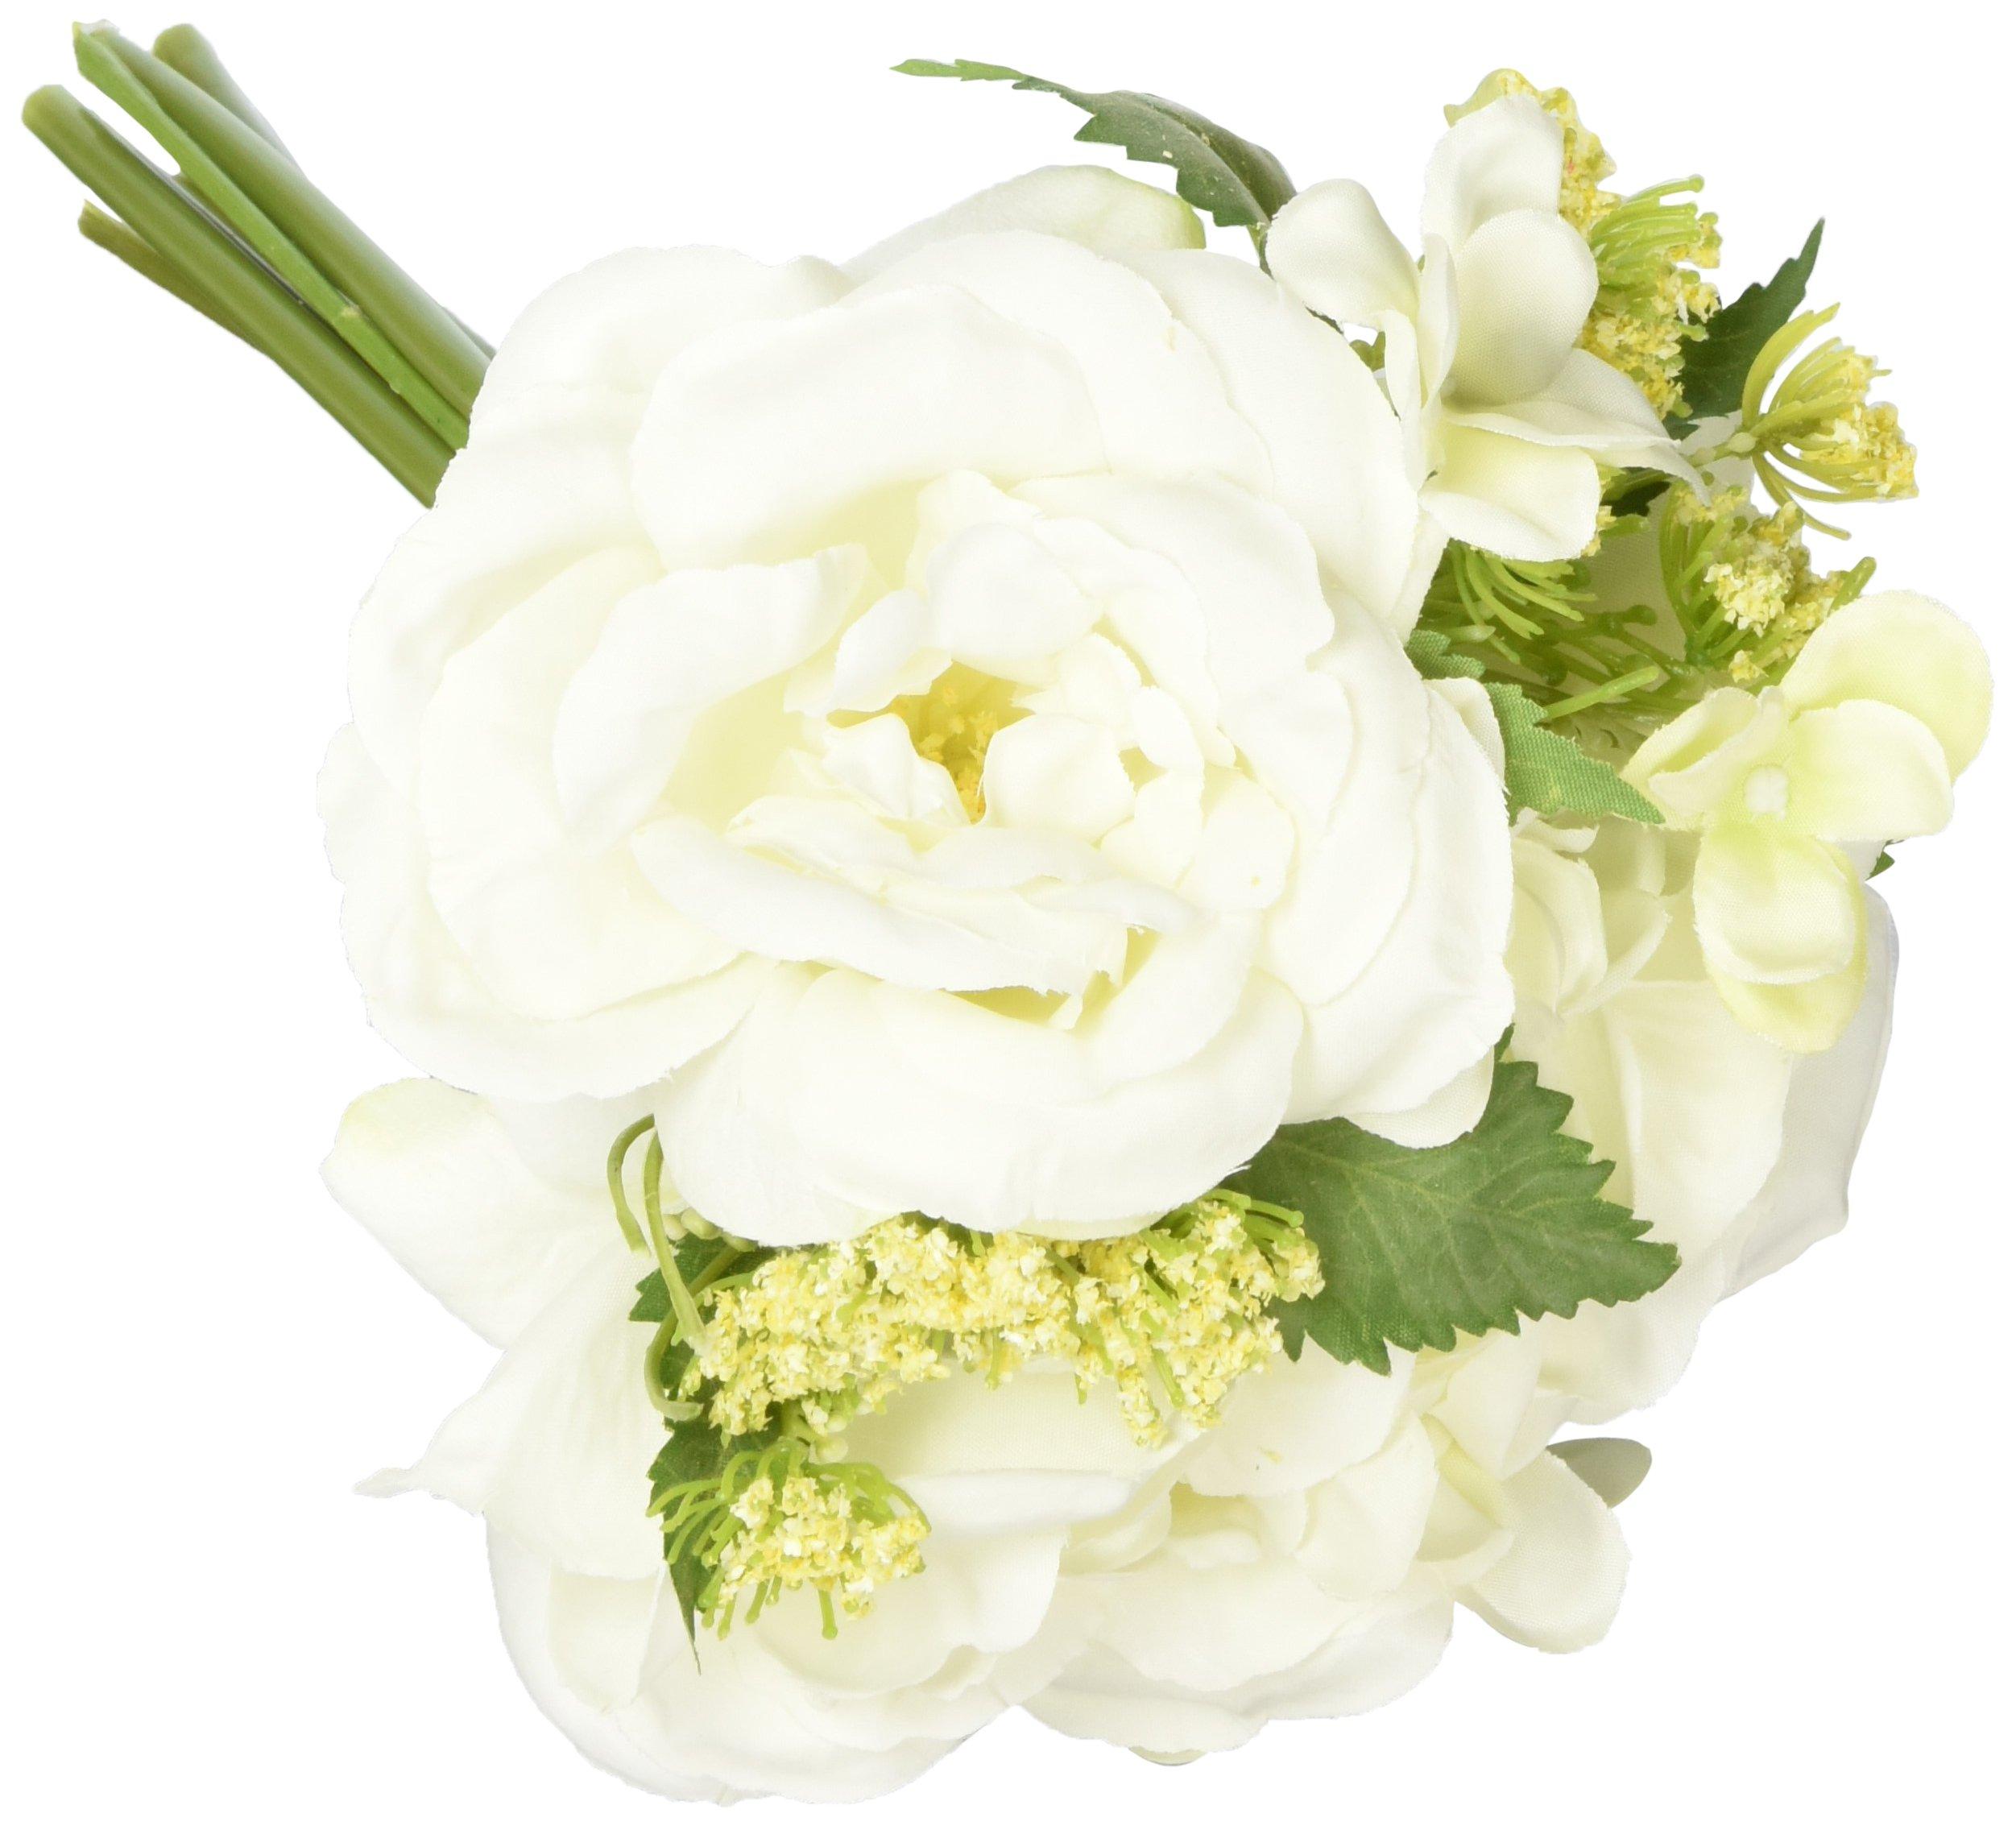 Darice NCG-14016 10'' Everyday Dropin Mixed Spring Bouquet Cream